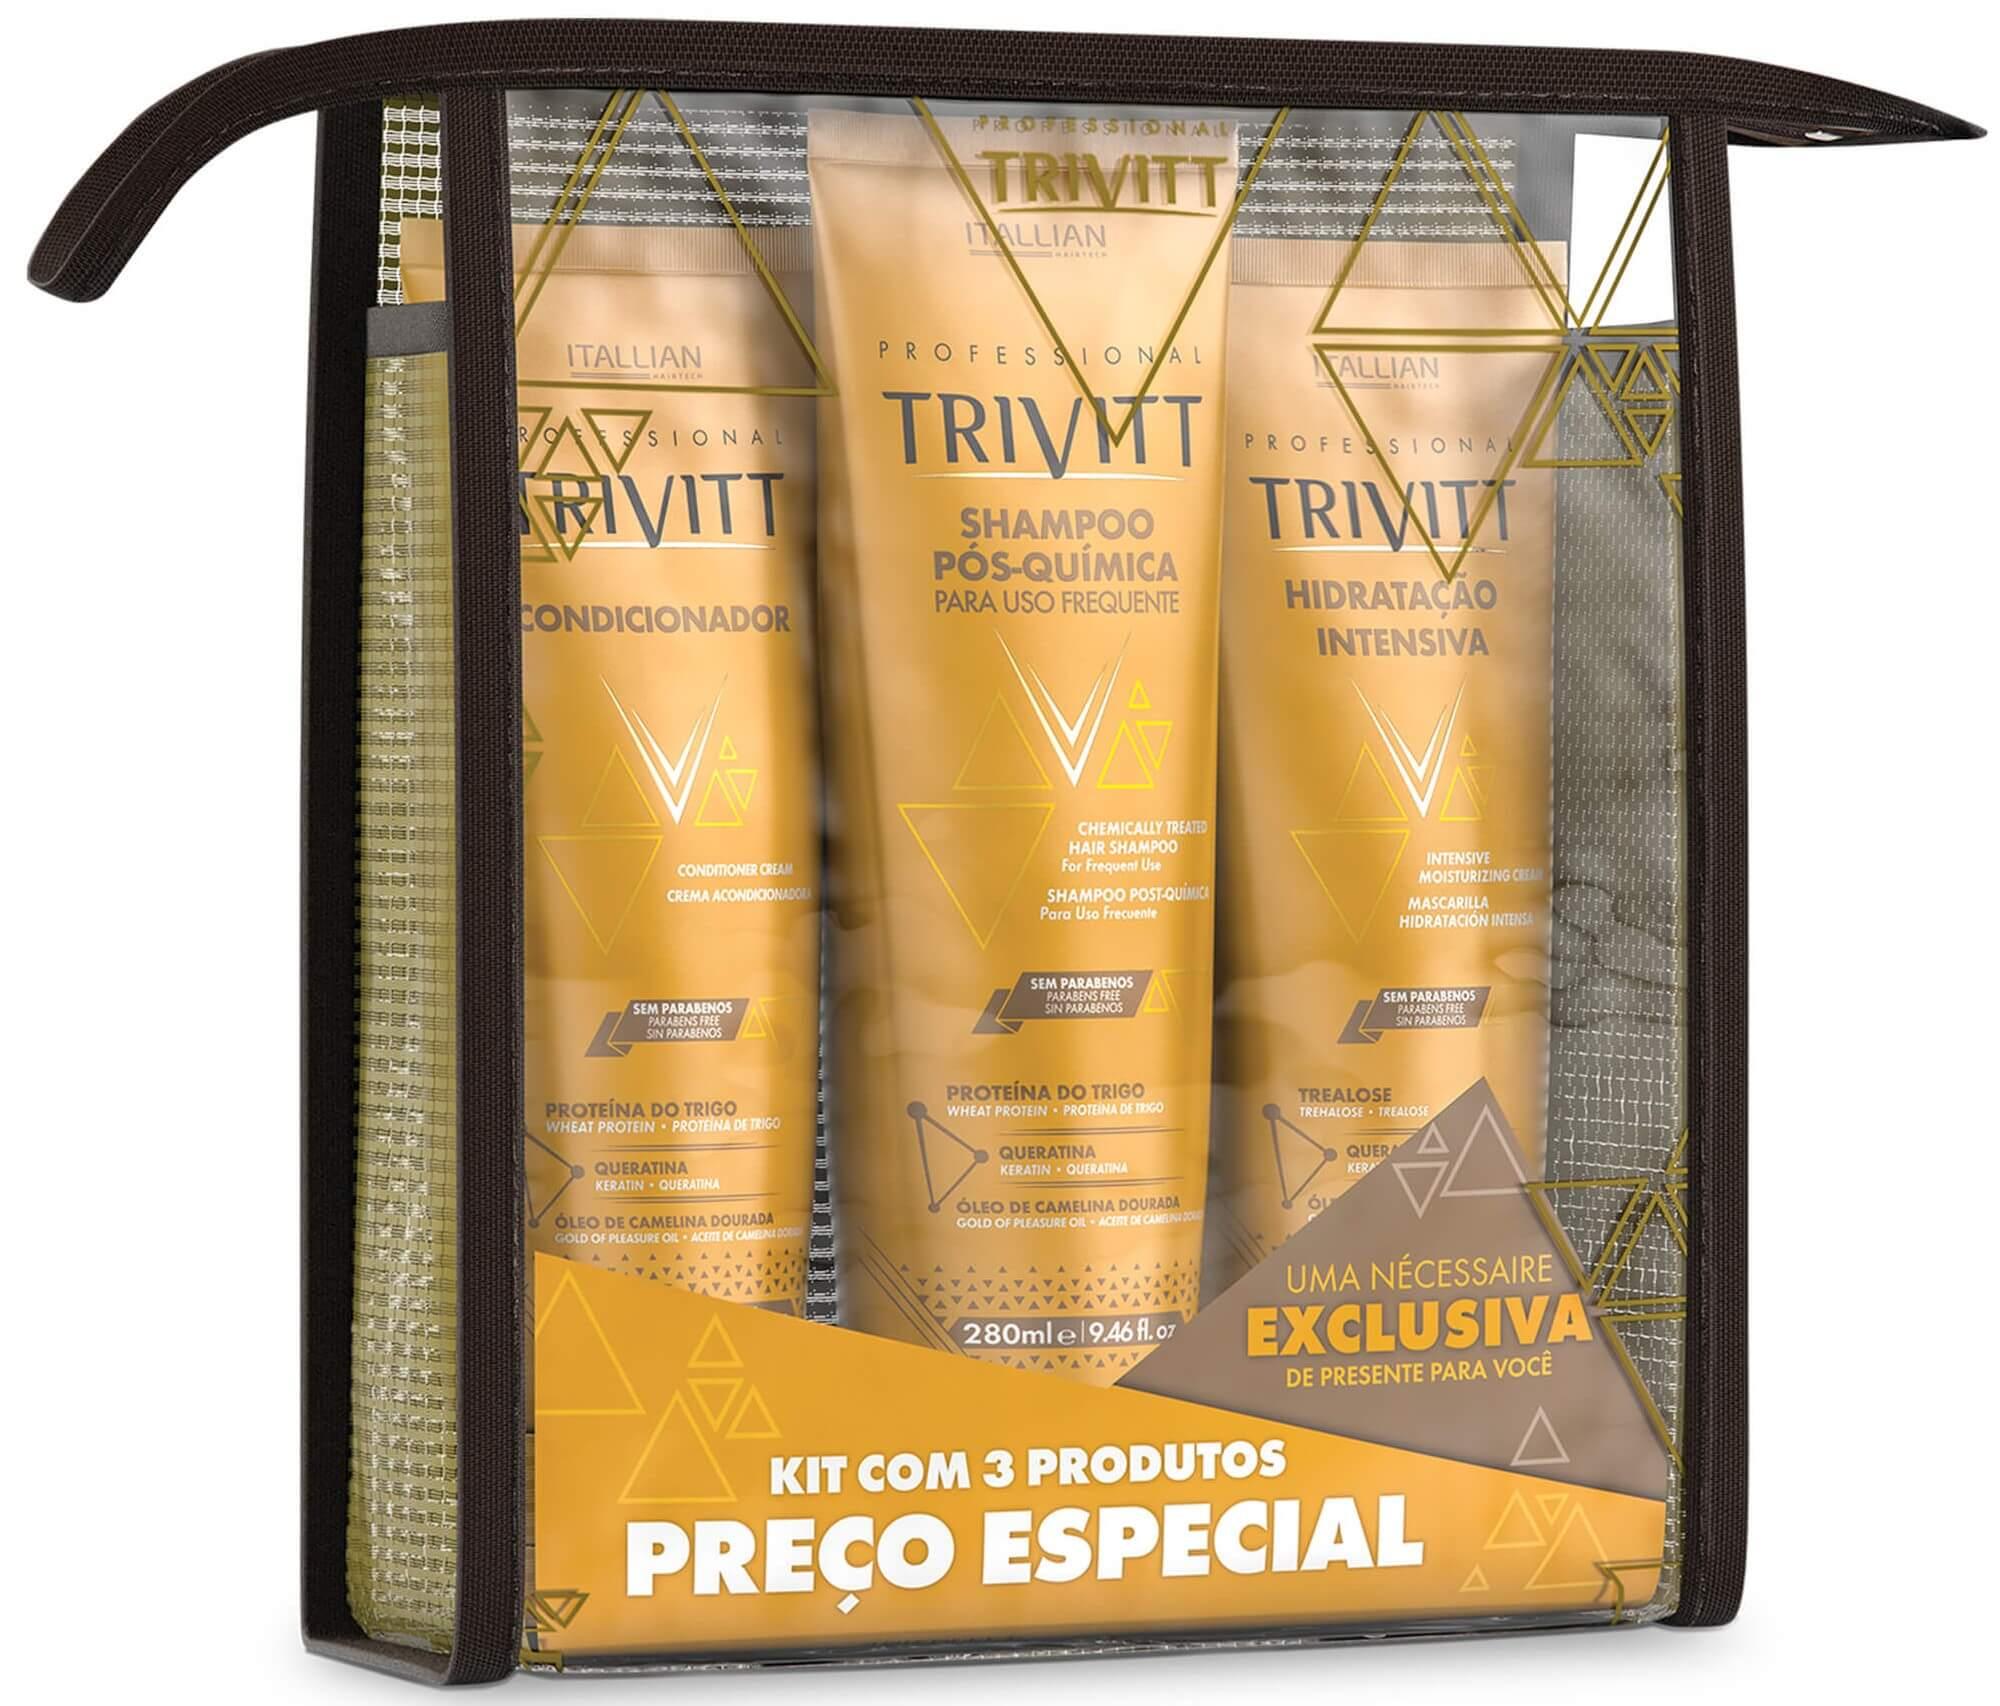 Kit Home Care Com Hidratação Intensiva Itallian Trivitt